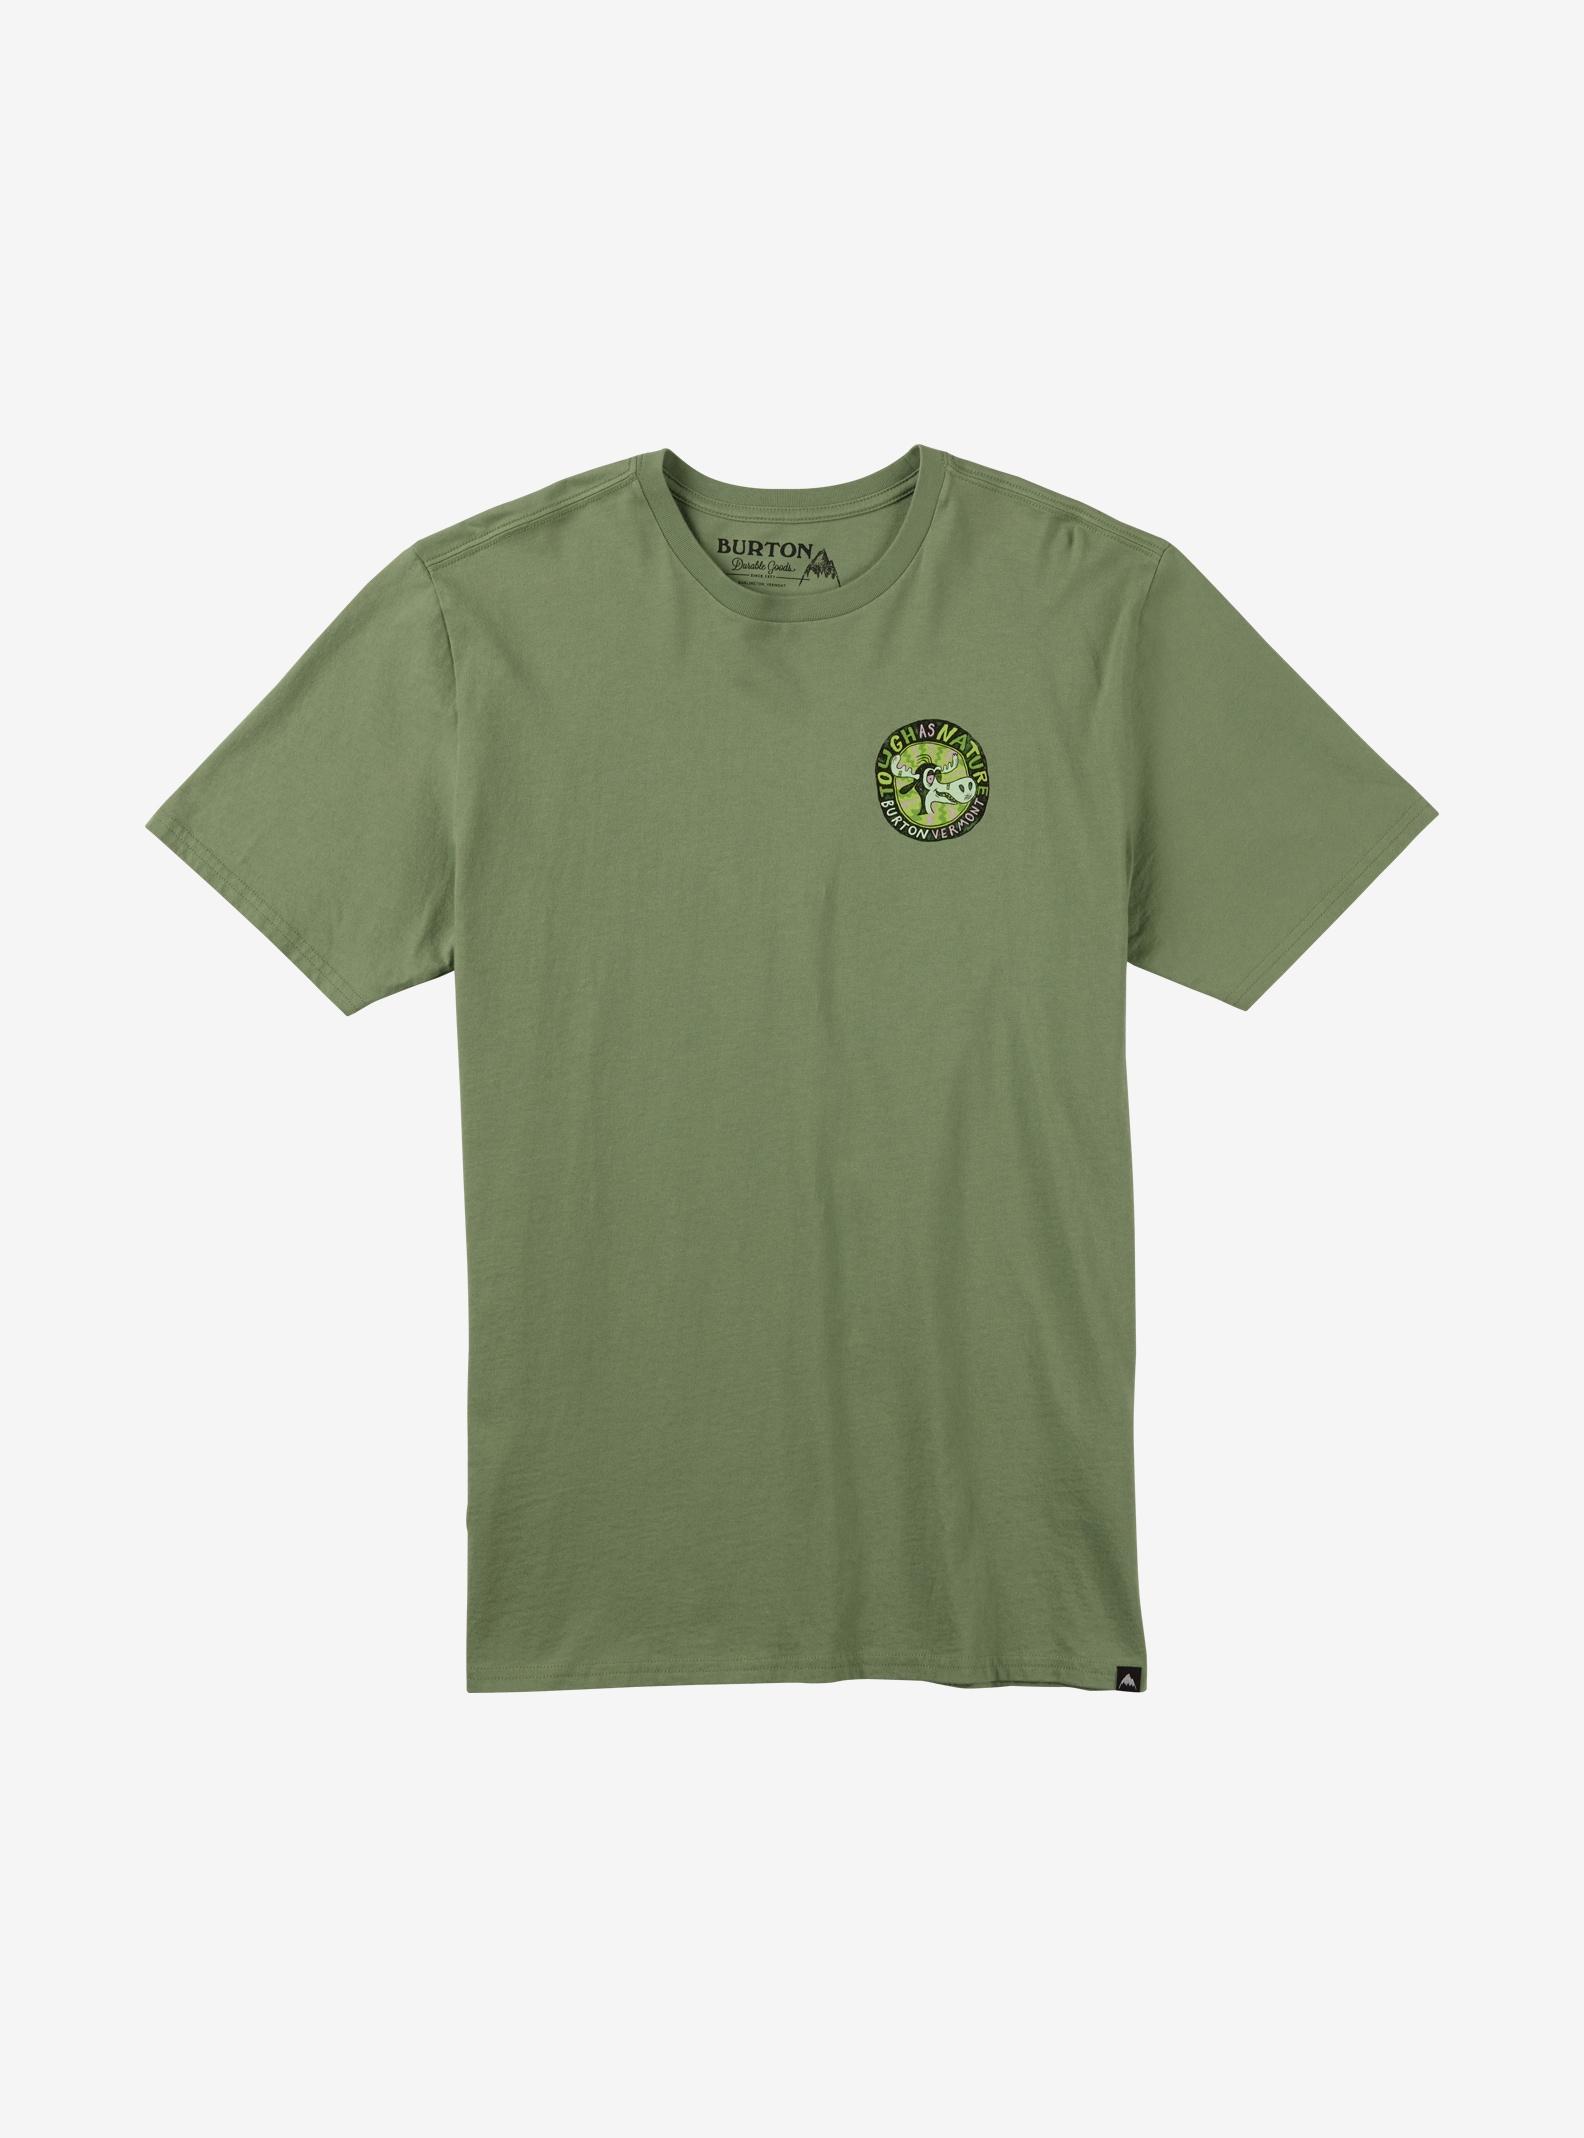 Burton Tough as Nature Short Sleeve T Shirt shown in Oil Green